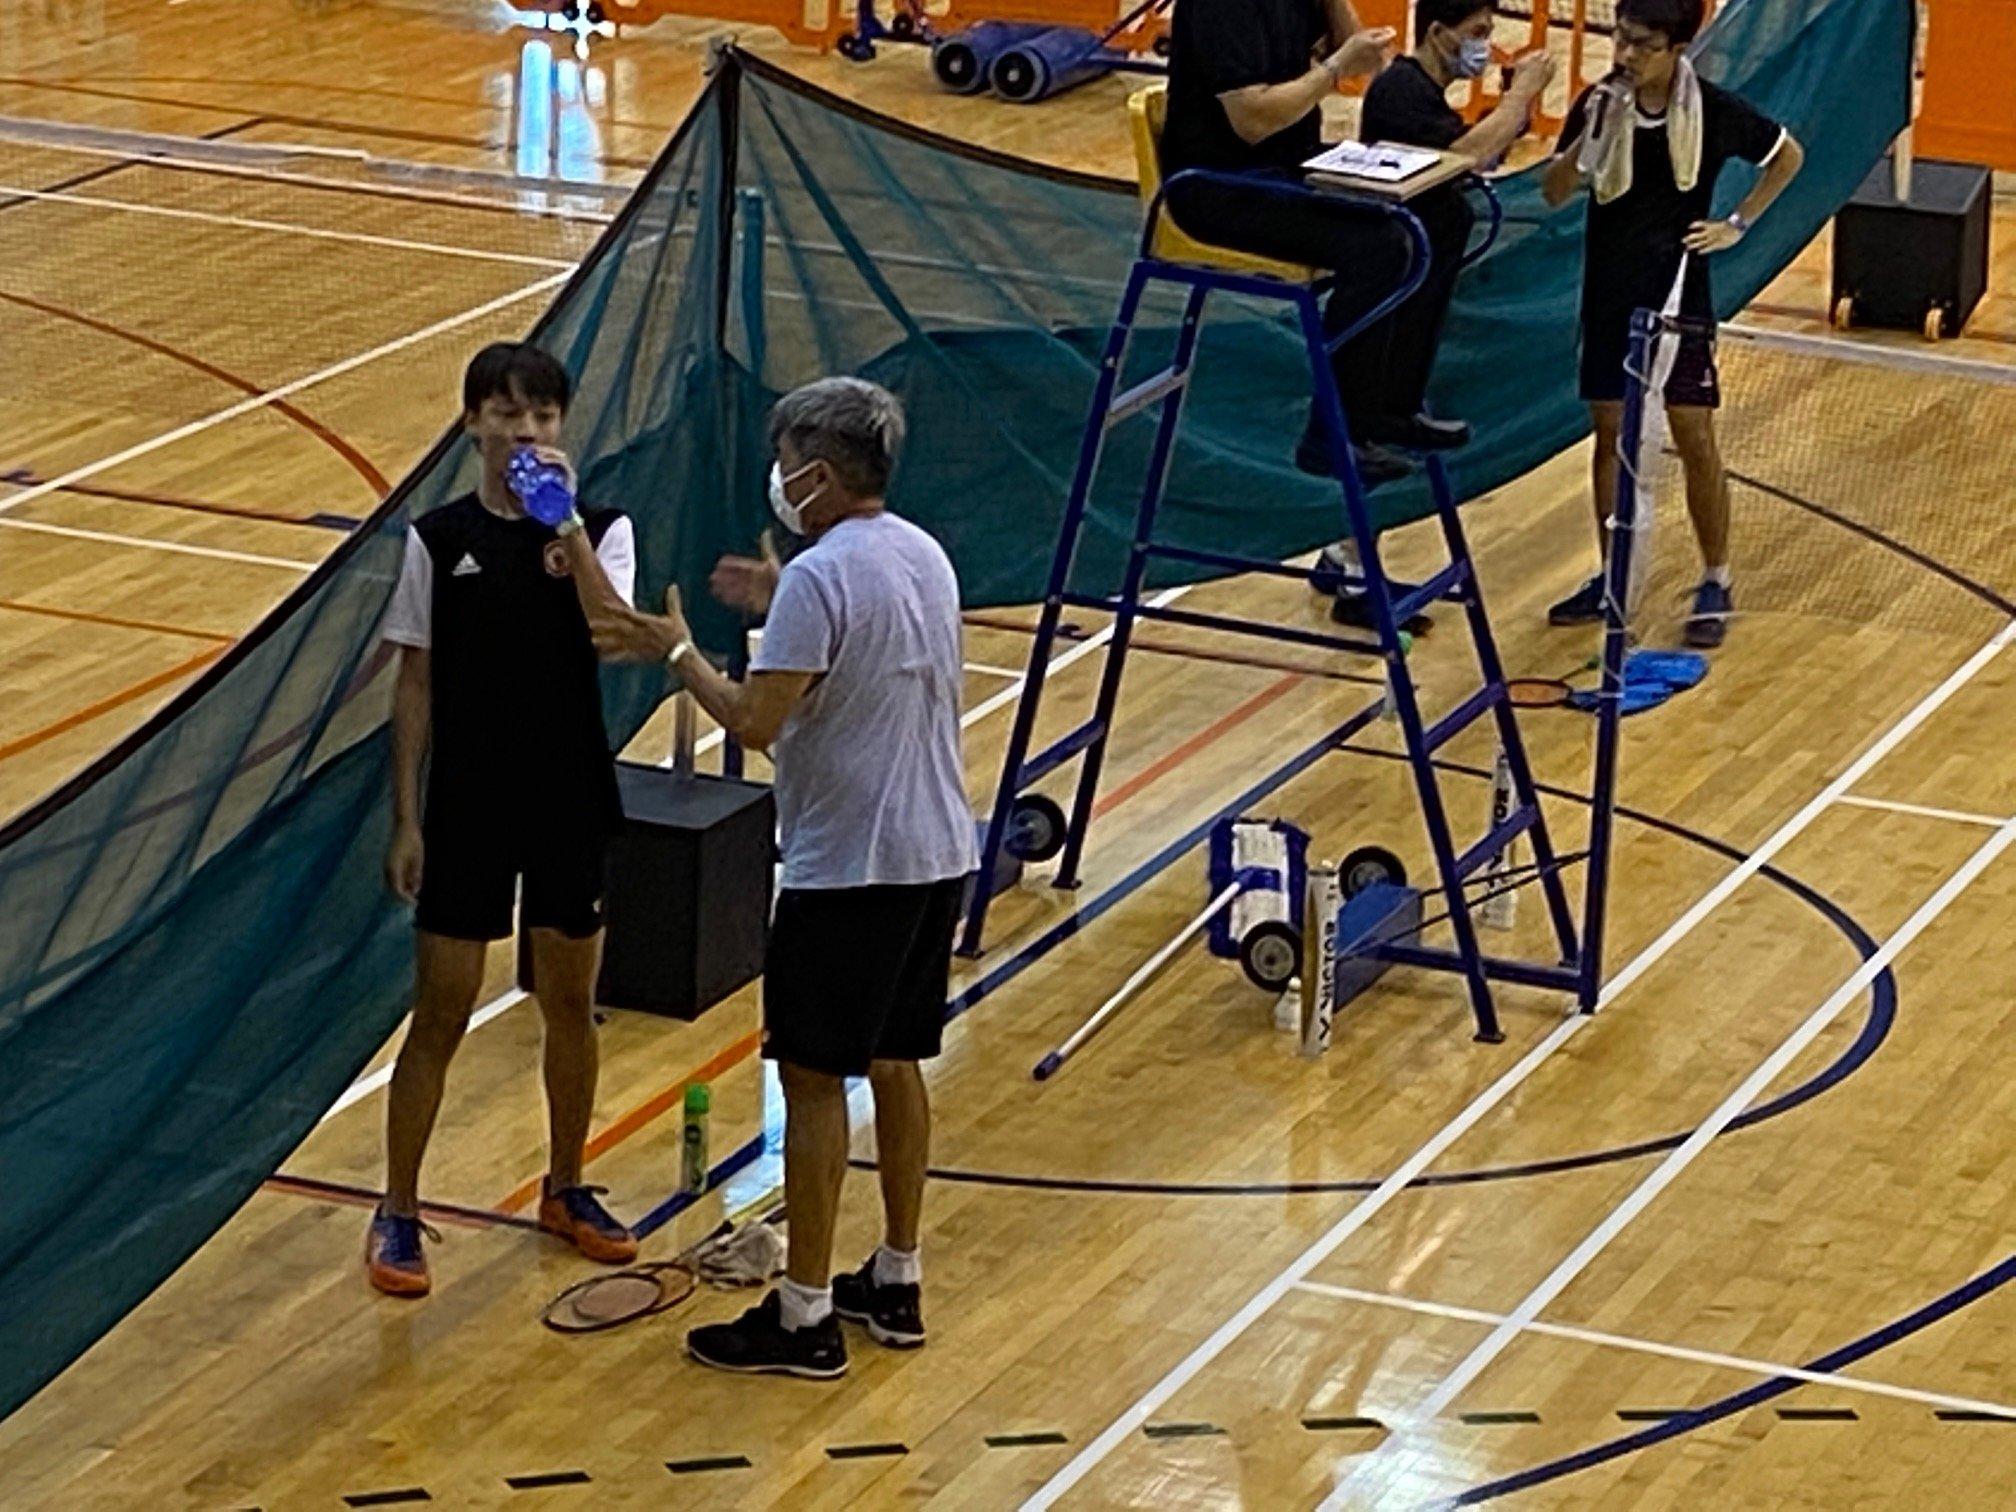 NSG A Div boys badminton - RI vs VJC second singles mid-set break Victor Soh being coached